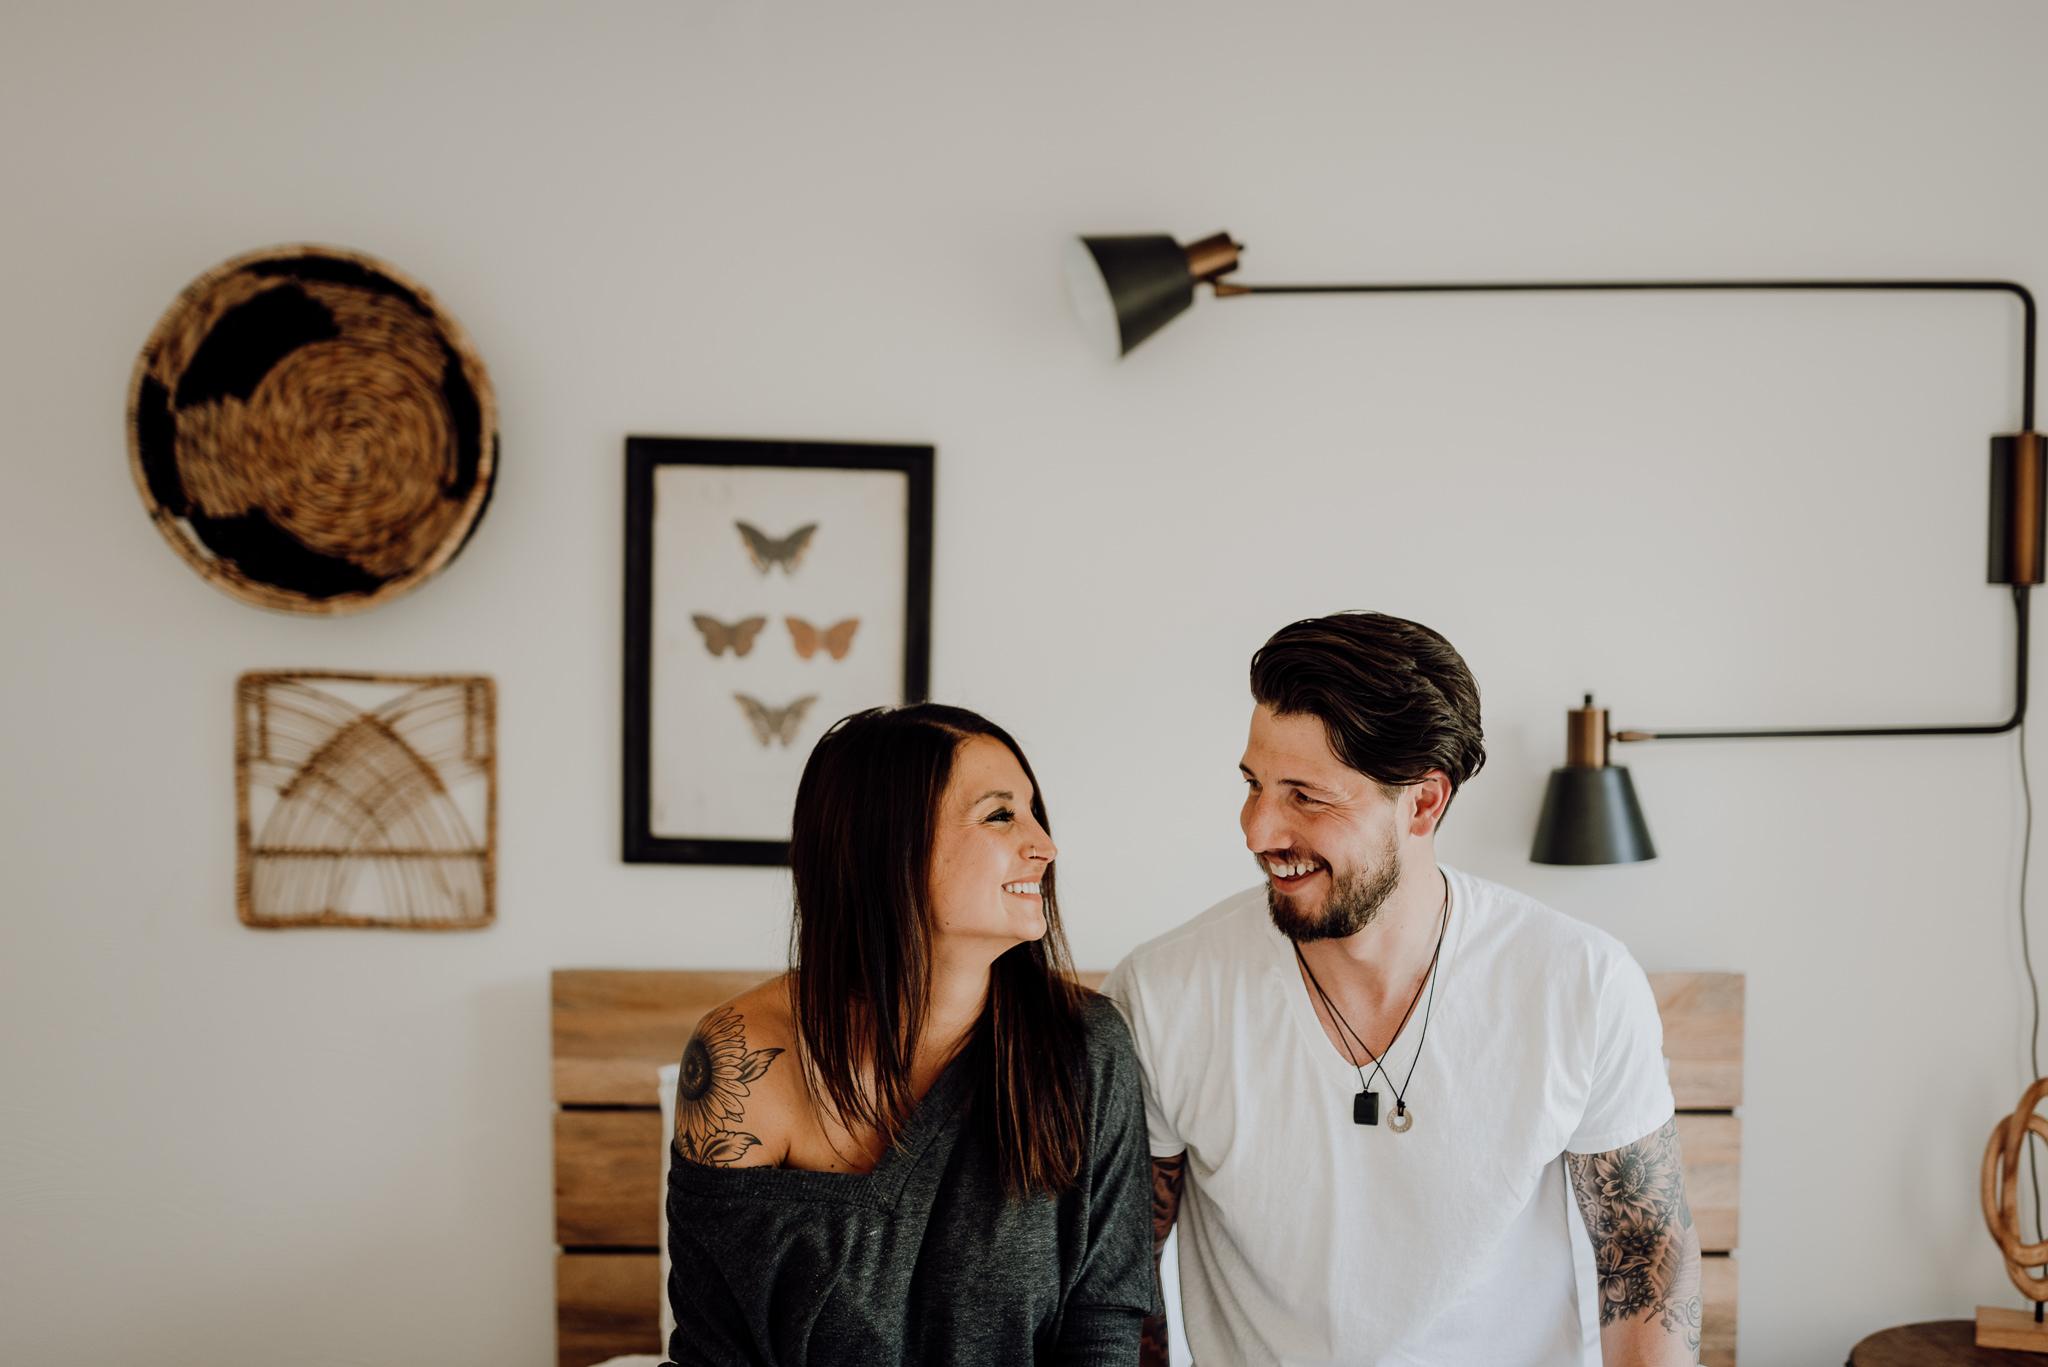 kristen giles photography | texas-wedding-elopement-photographer-oklahoma airbnb session-18-blog.jpg